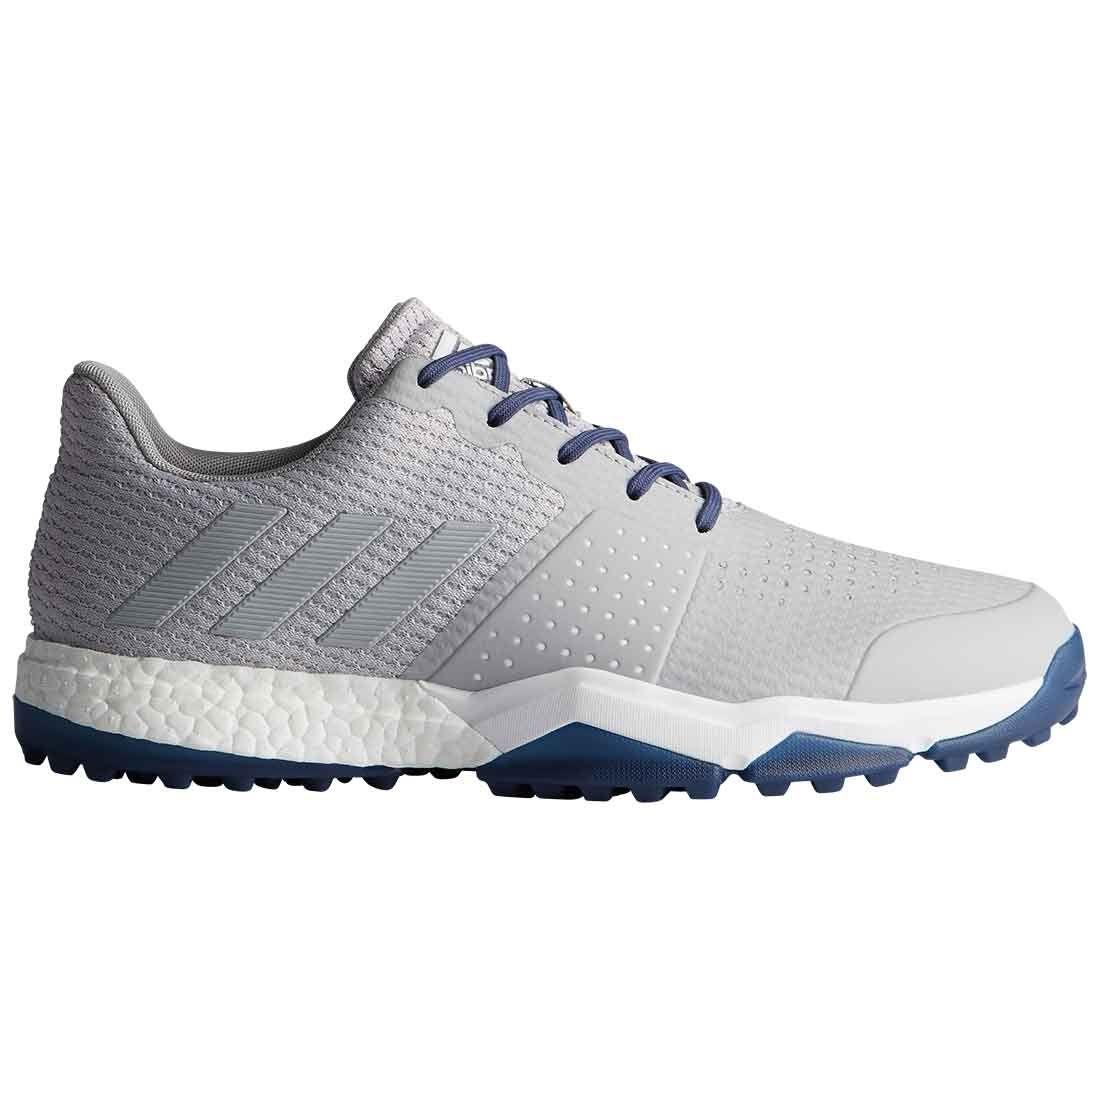 Buy Adidas AdiPower Sport Boost 3 Golf